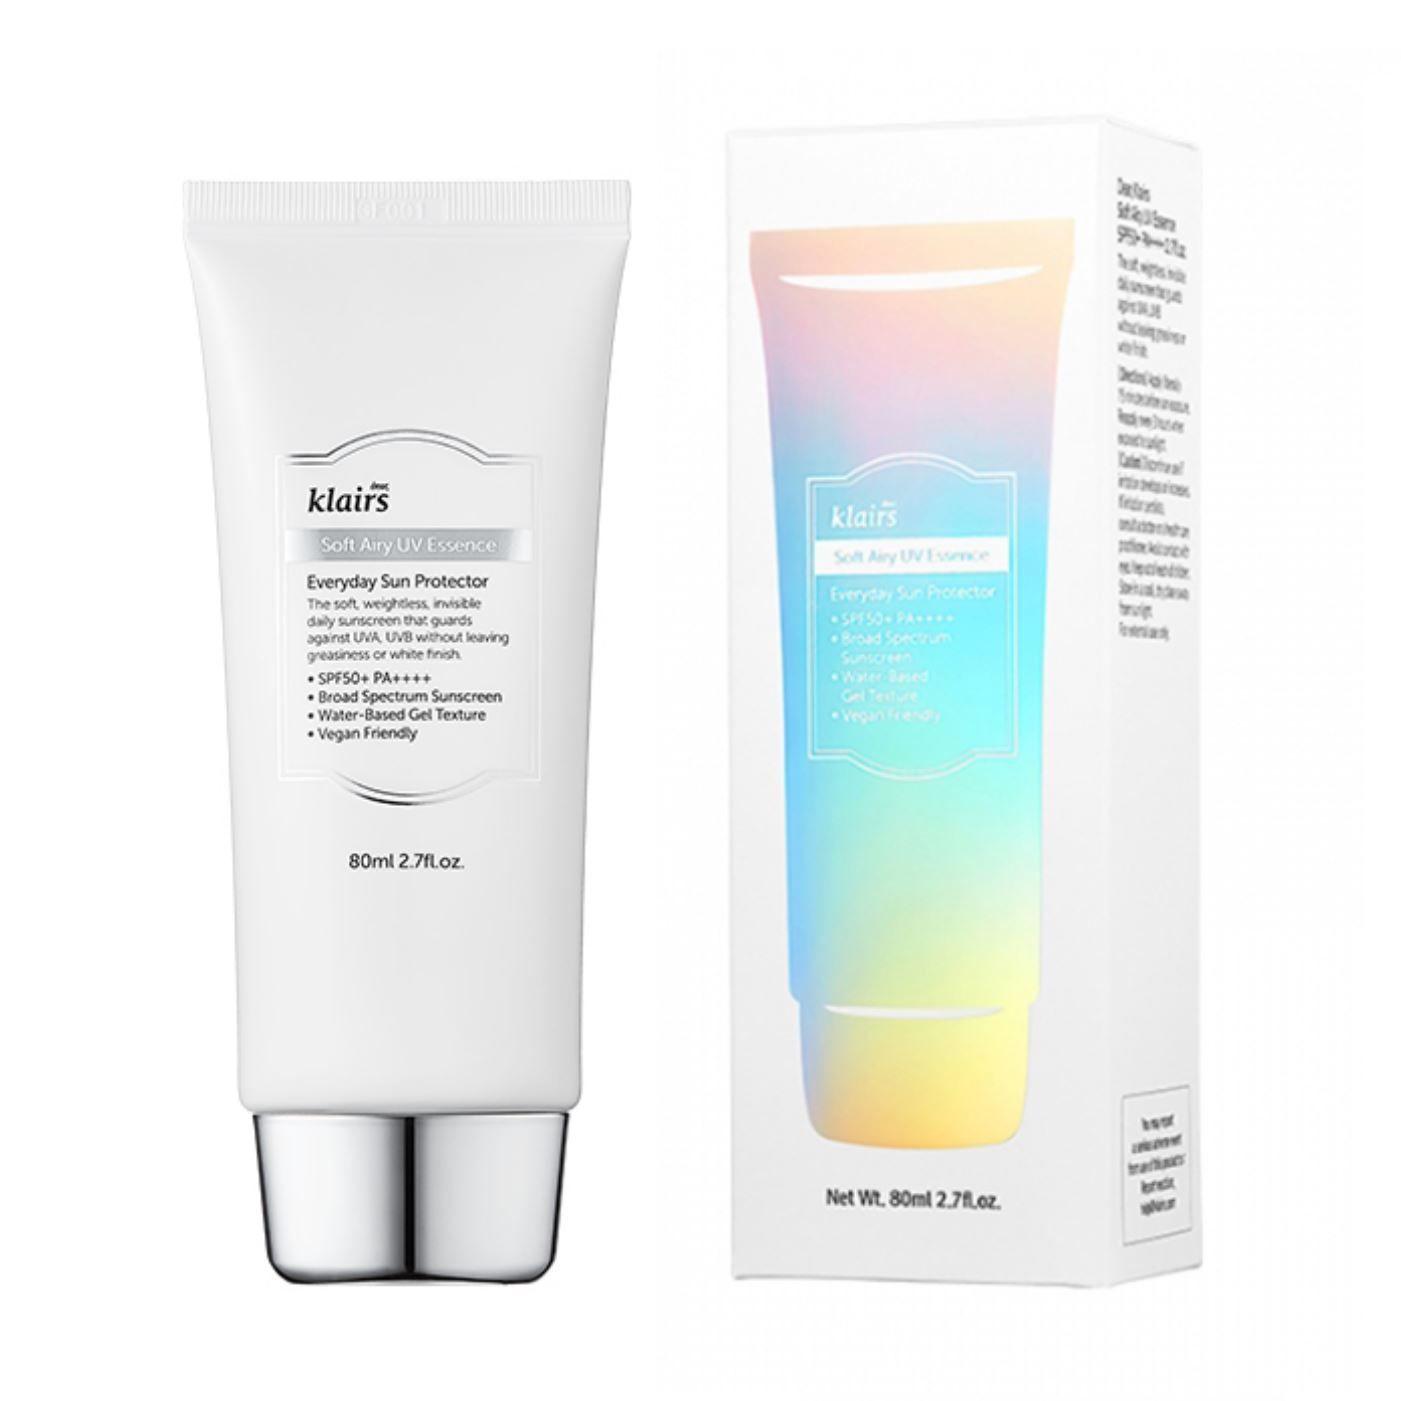 Soft Airy UV Essence SPF 50 PA ++++